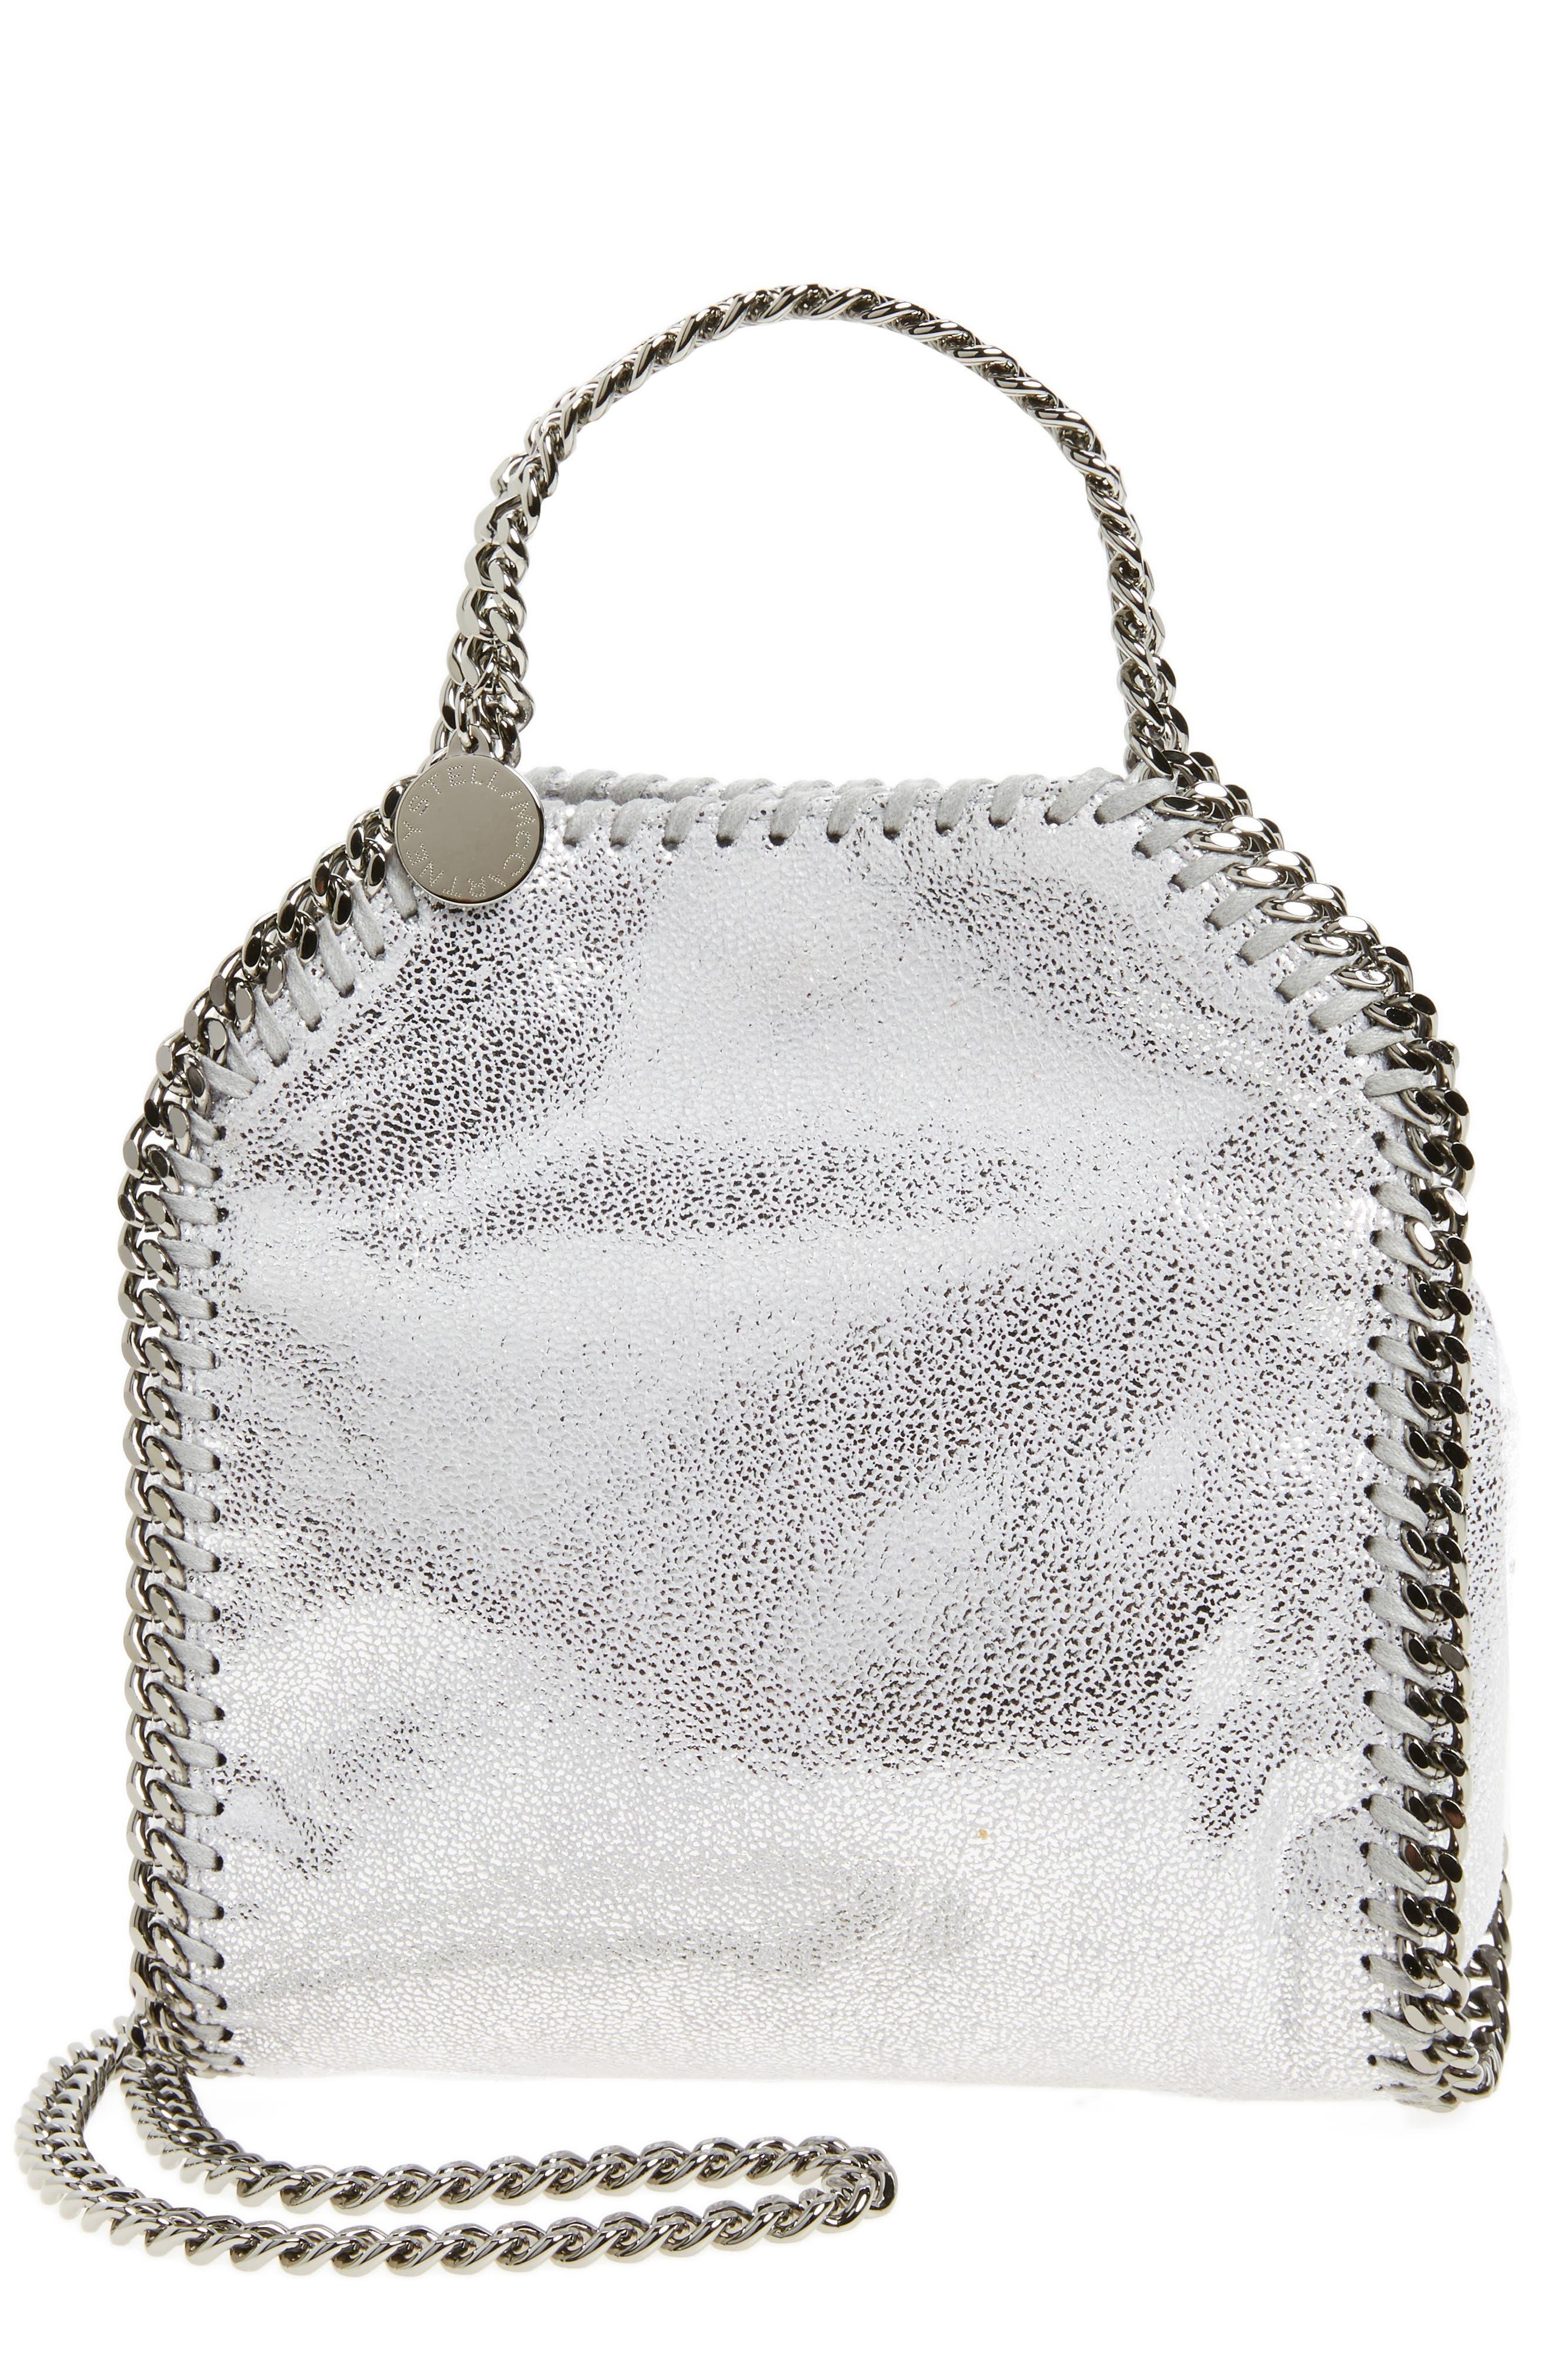 'Tiny Falabella' Metallic Faux Leather Crossbody Bag,                         Main,                         color, 045